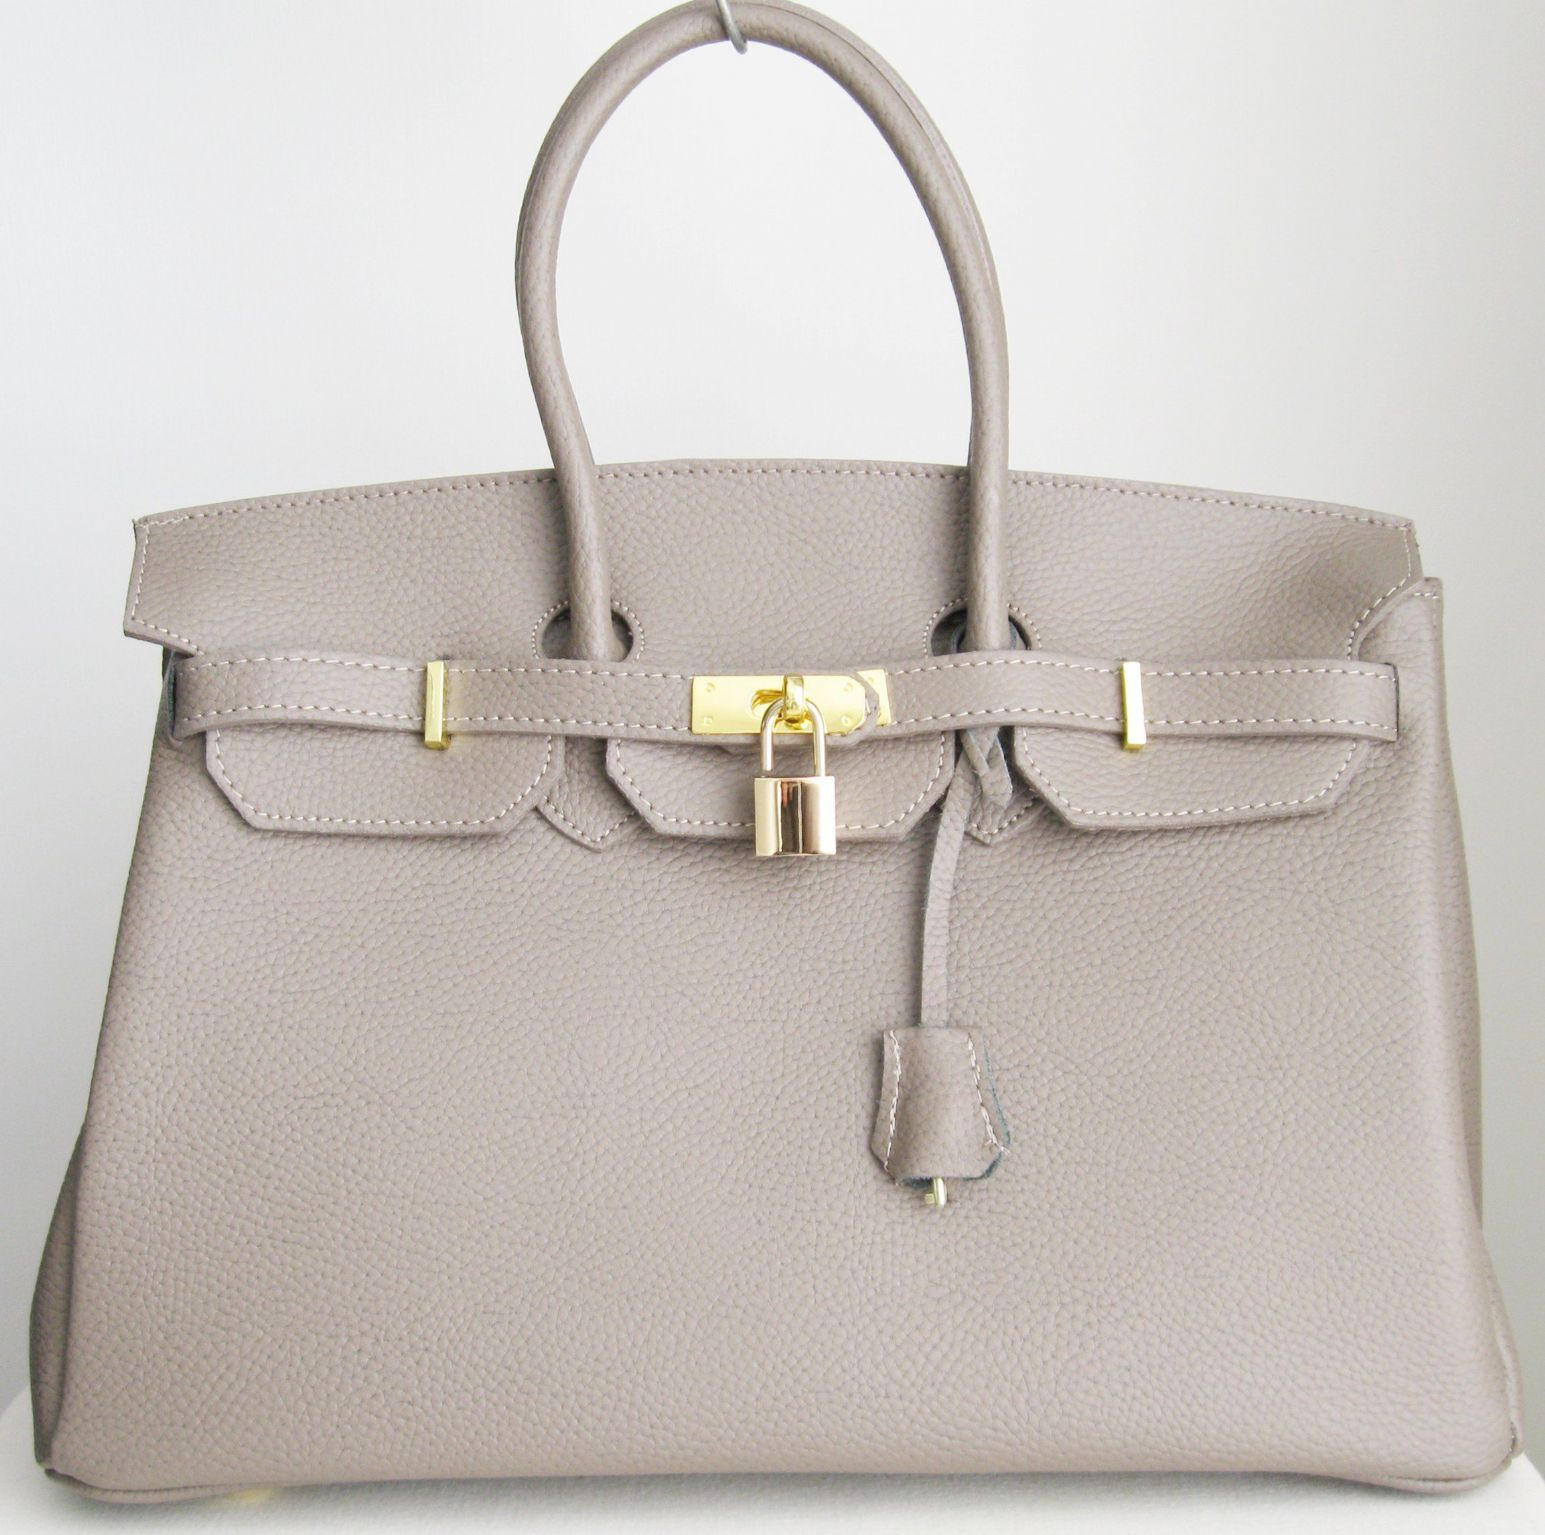 aaa08dc3cc9b grey-taupe-birkin-inspired-beautiful-italian-leather-handbag -with-gold-coloured-trims